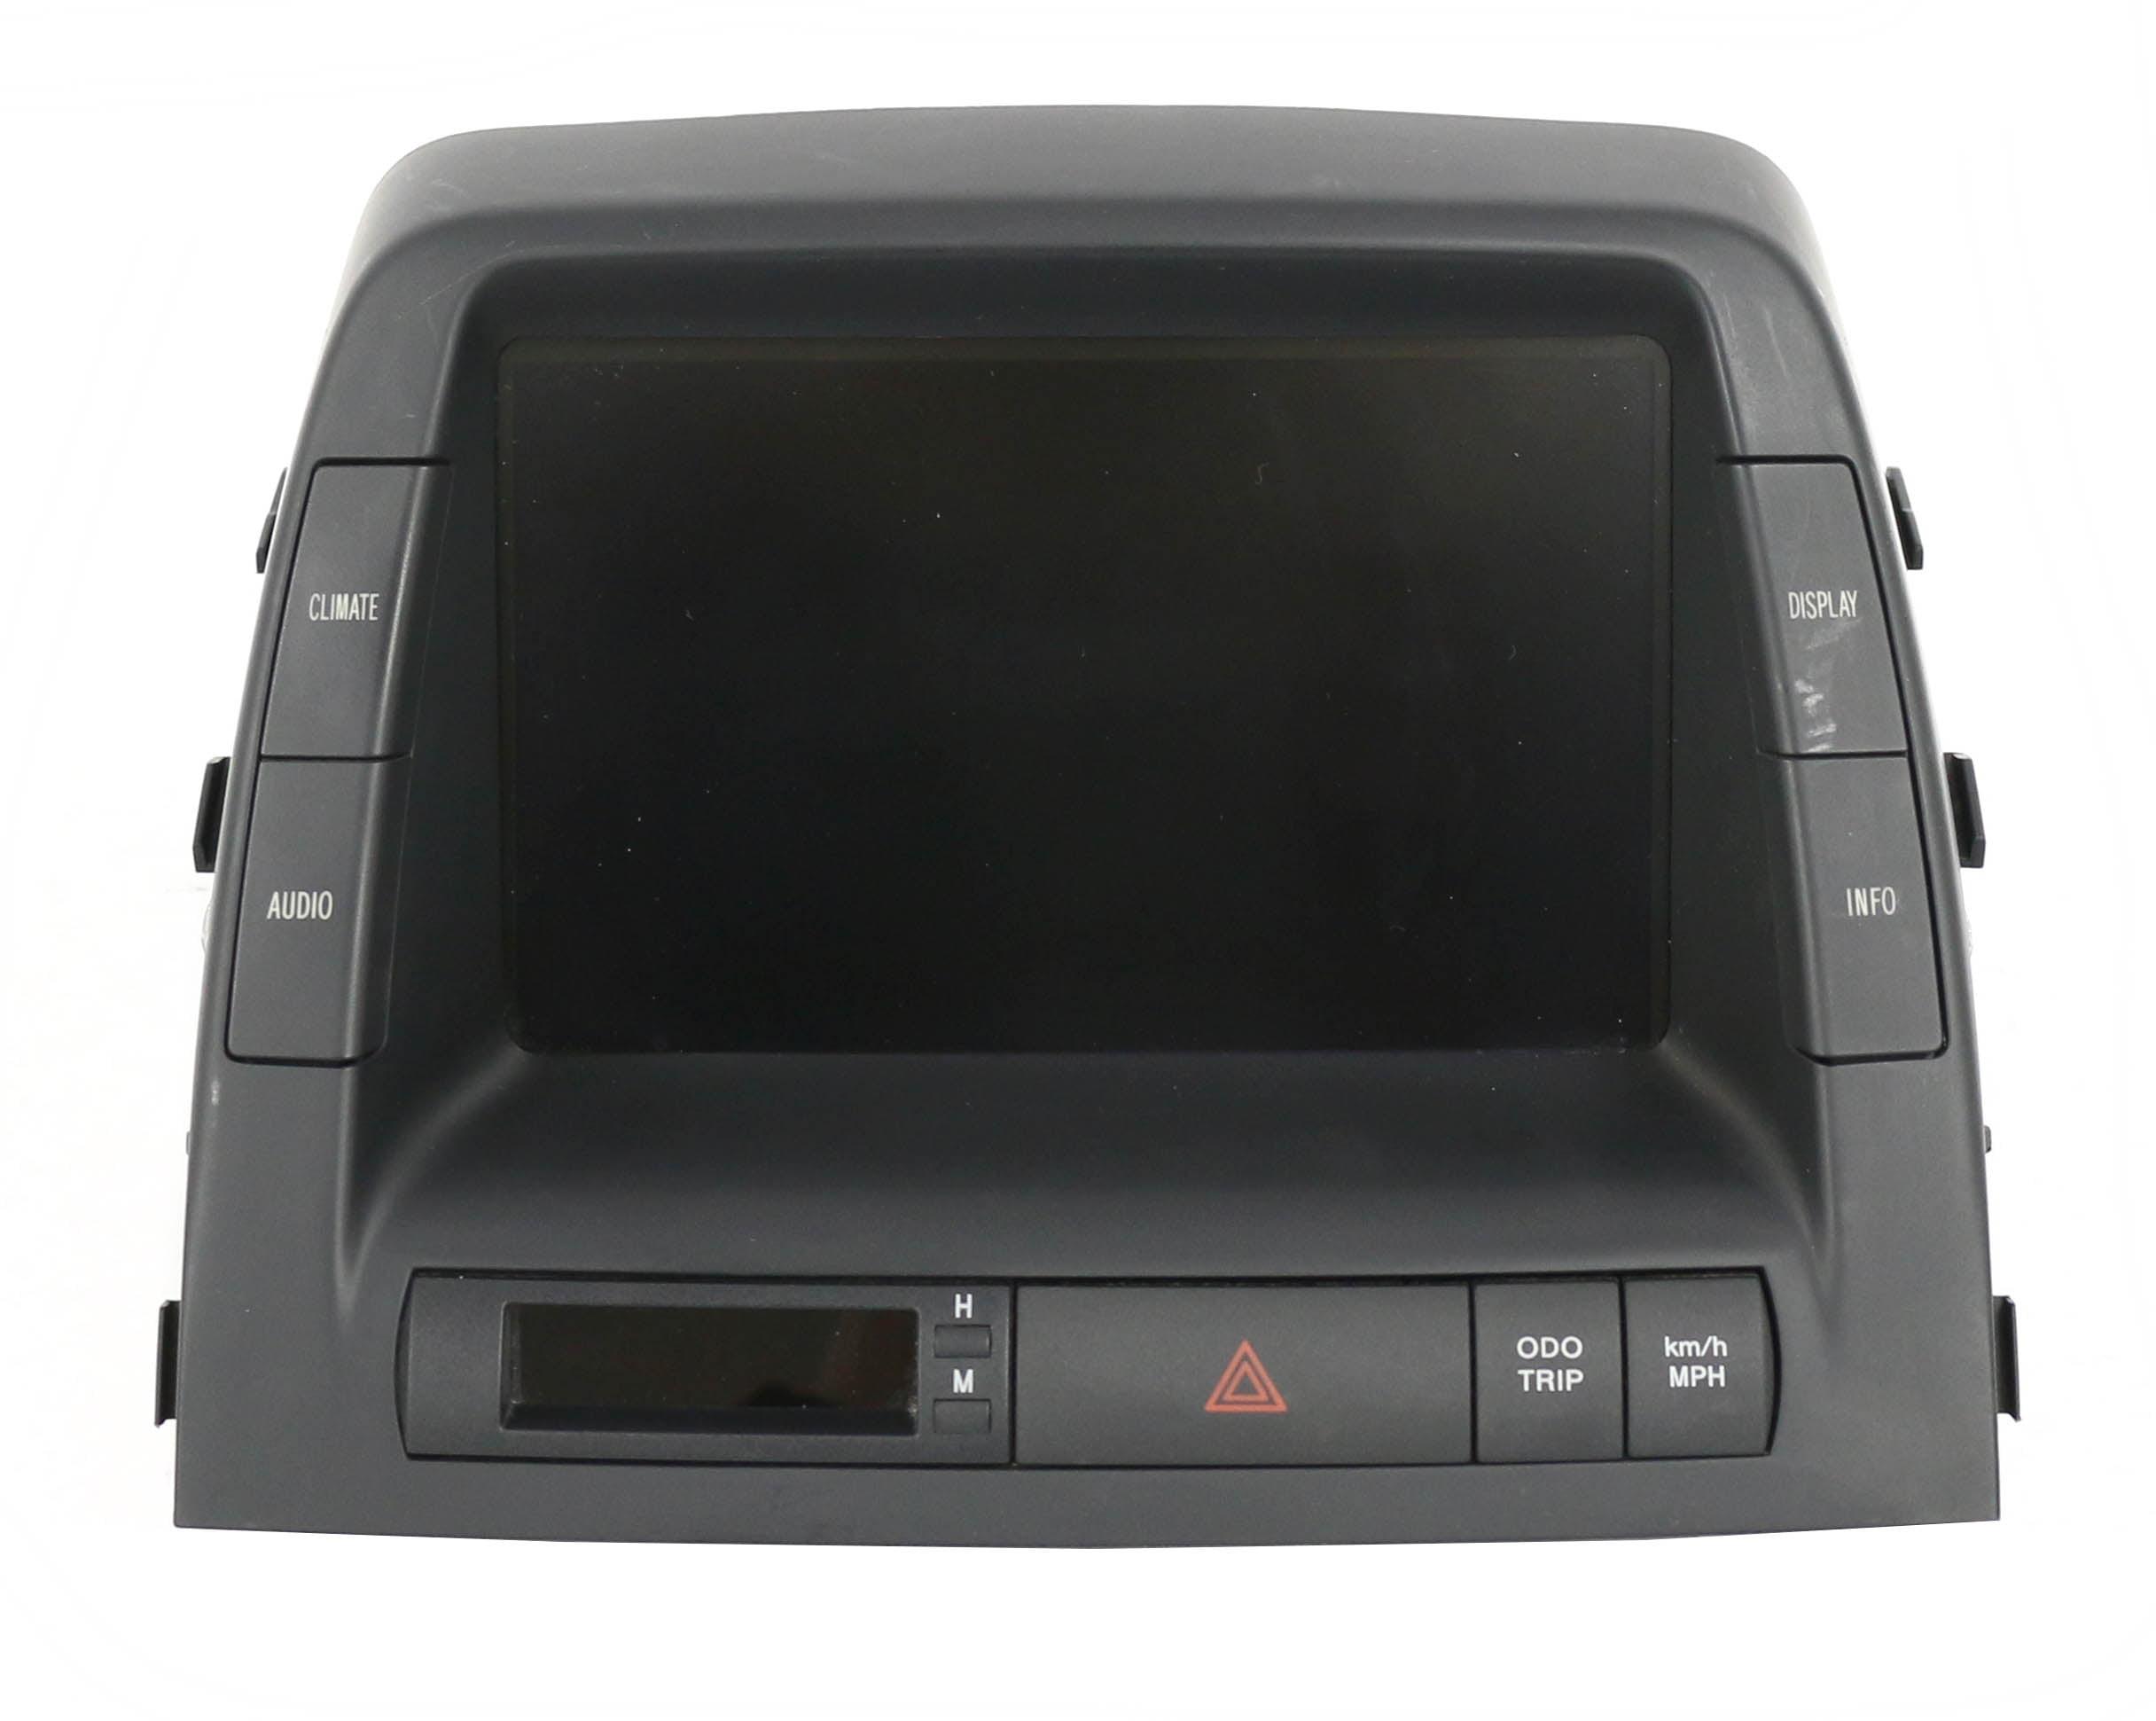 04-09 Toyota Prius Radio Information Display Screen Monitor